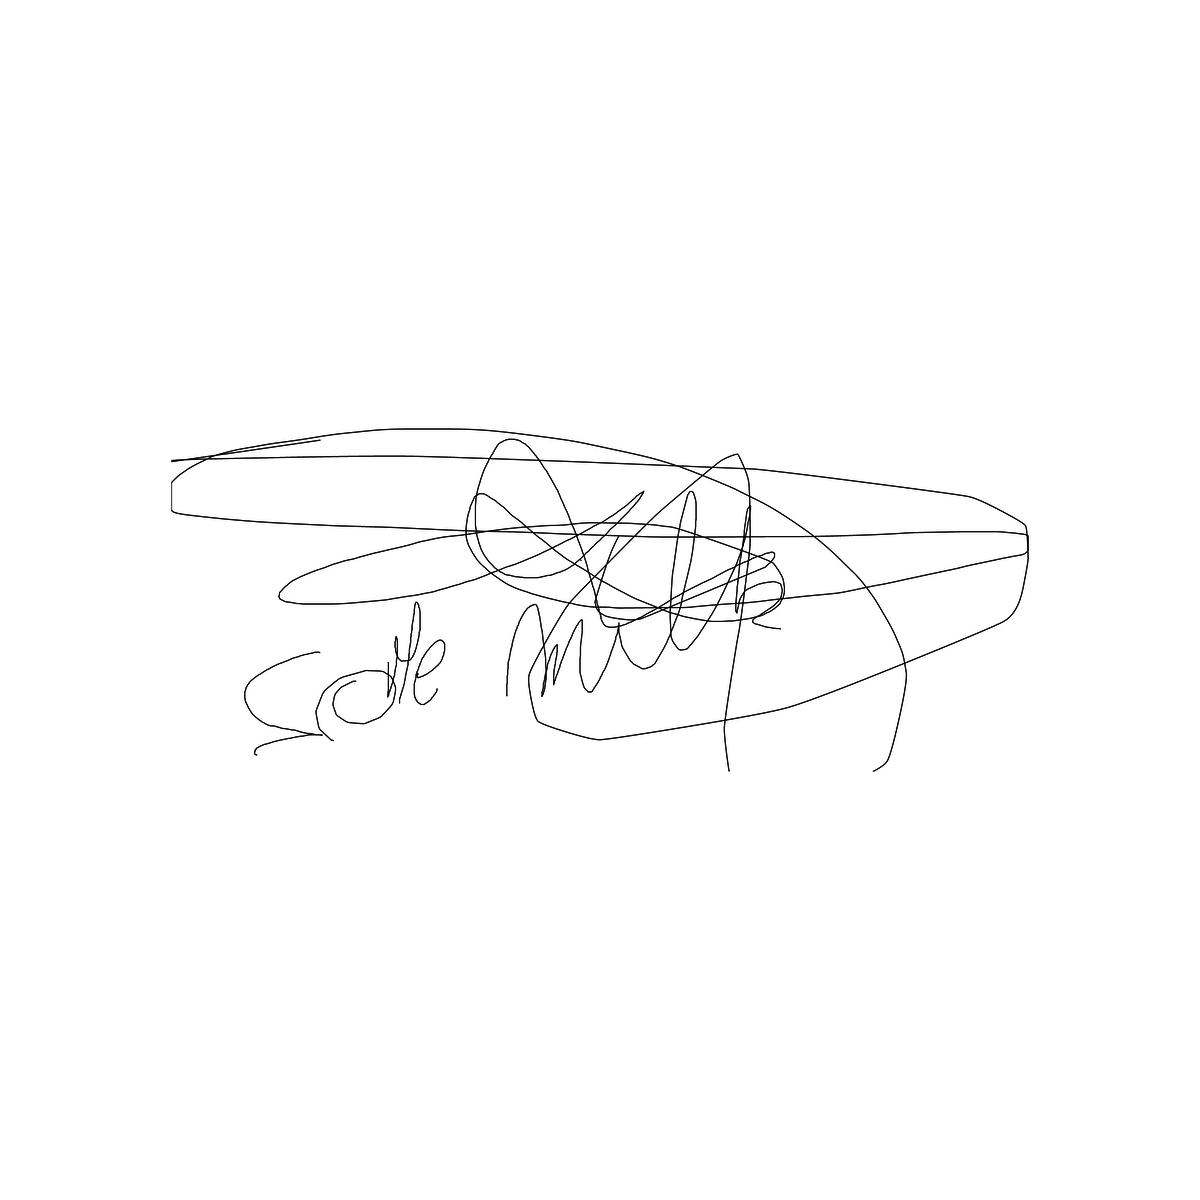 BAAAM drawing#22308 lat:43.6452331542968750lng: 6.9714260101318360